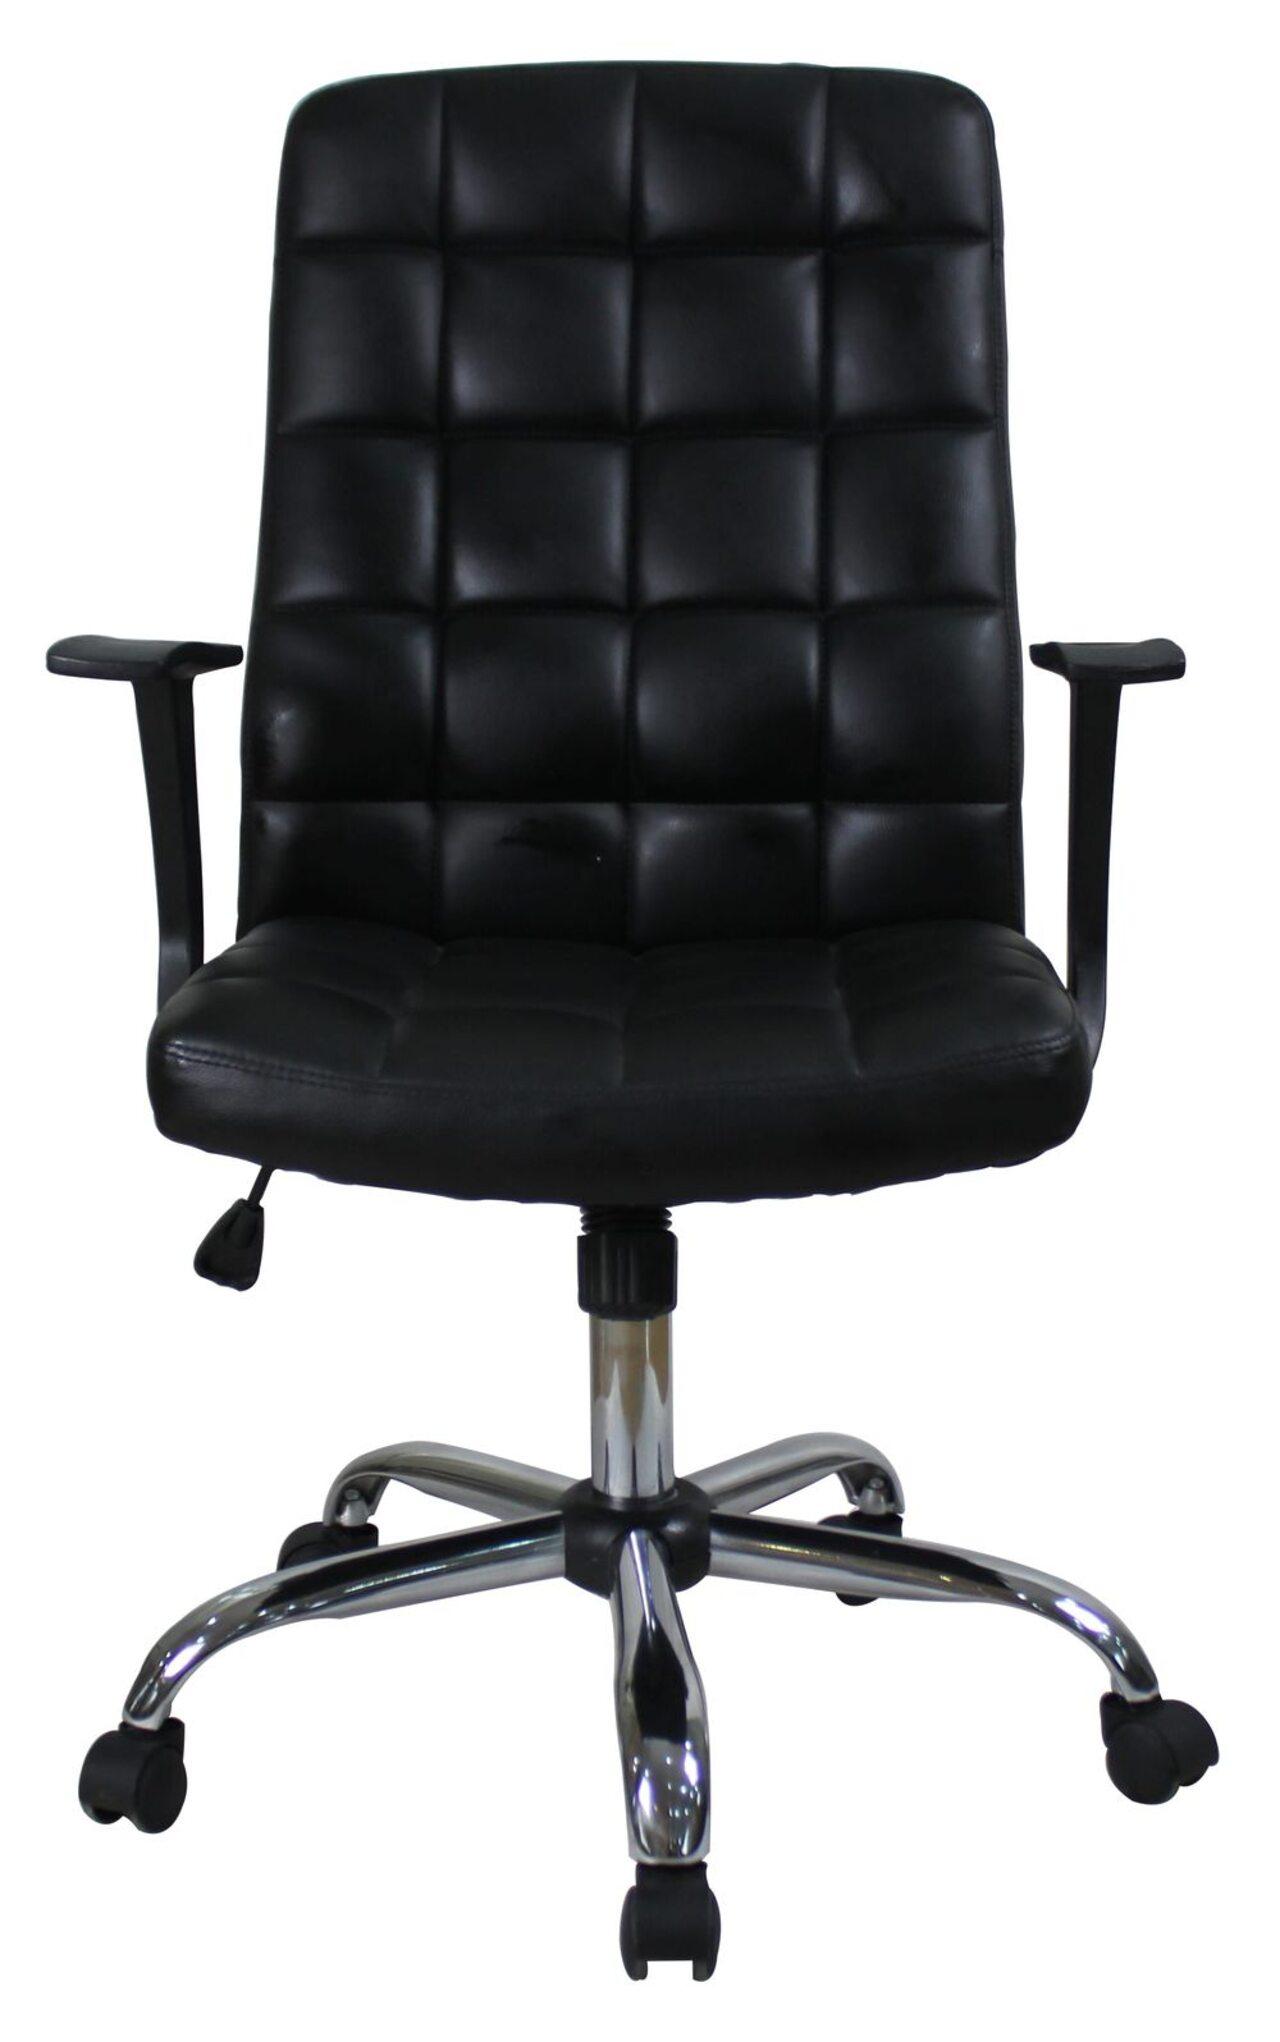 Кресло руководителя College BX-3619 - фото 3